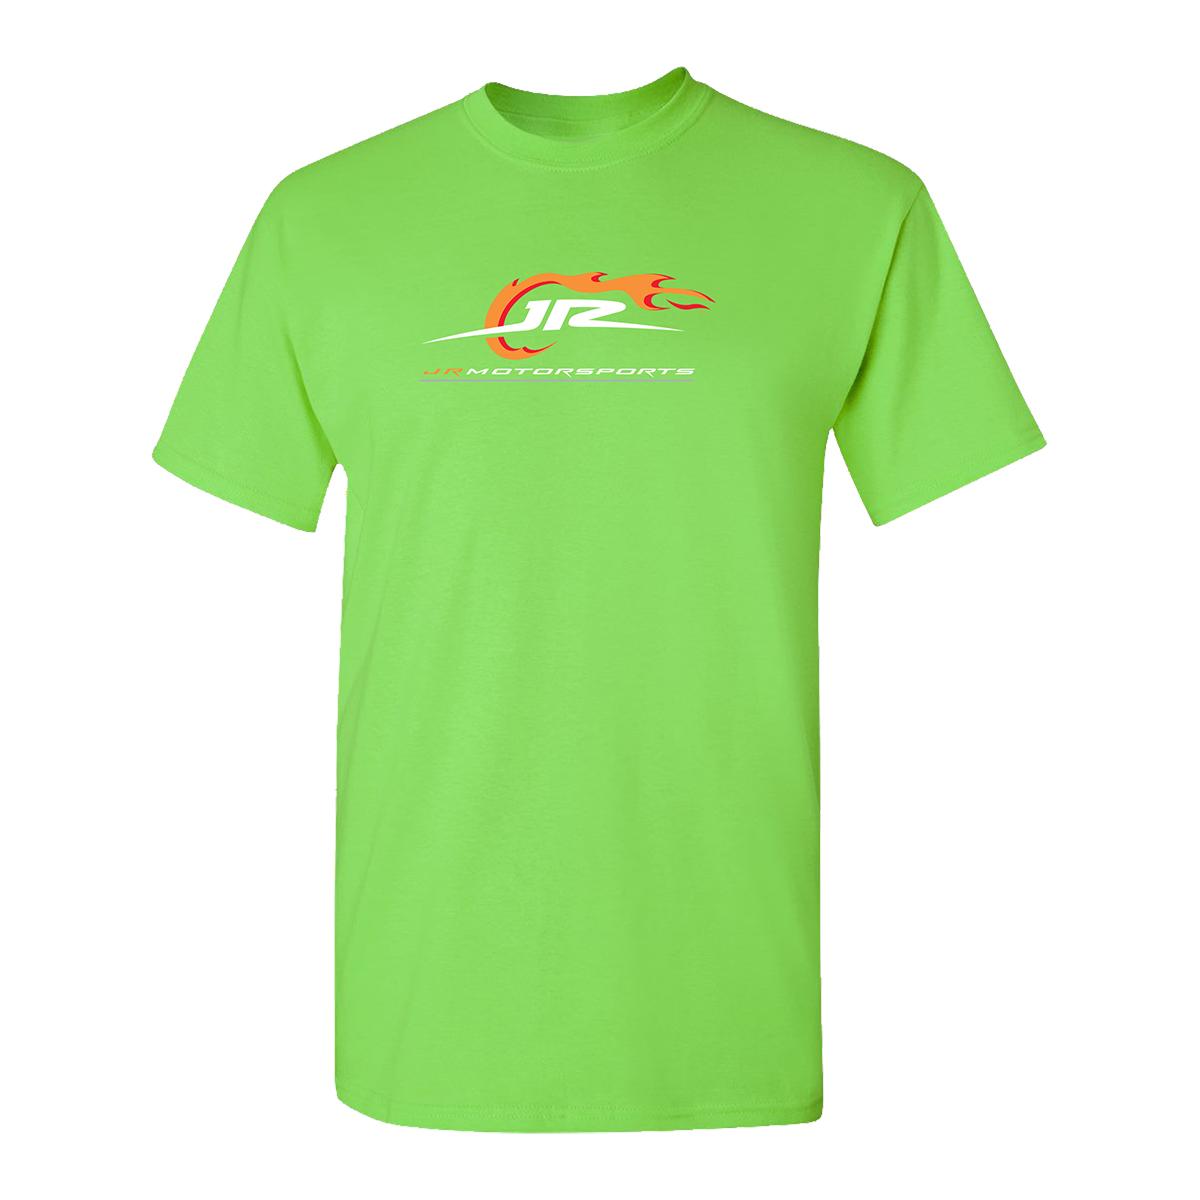 2019 NASCAR Jr. Motorsports Speed Never Sleeps Green T-shirt